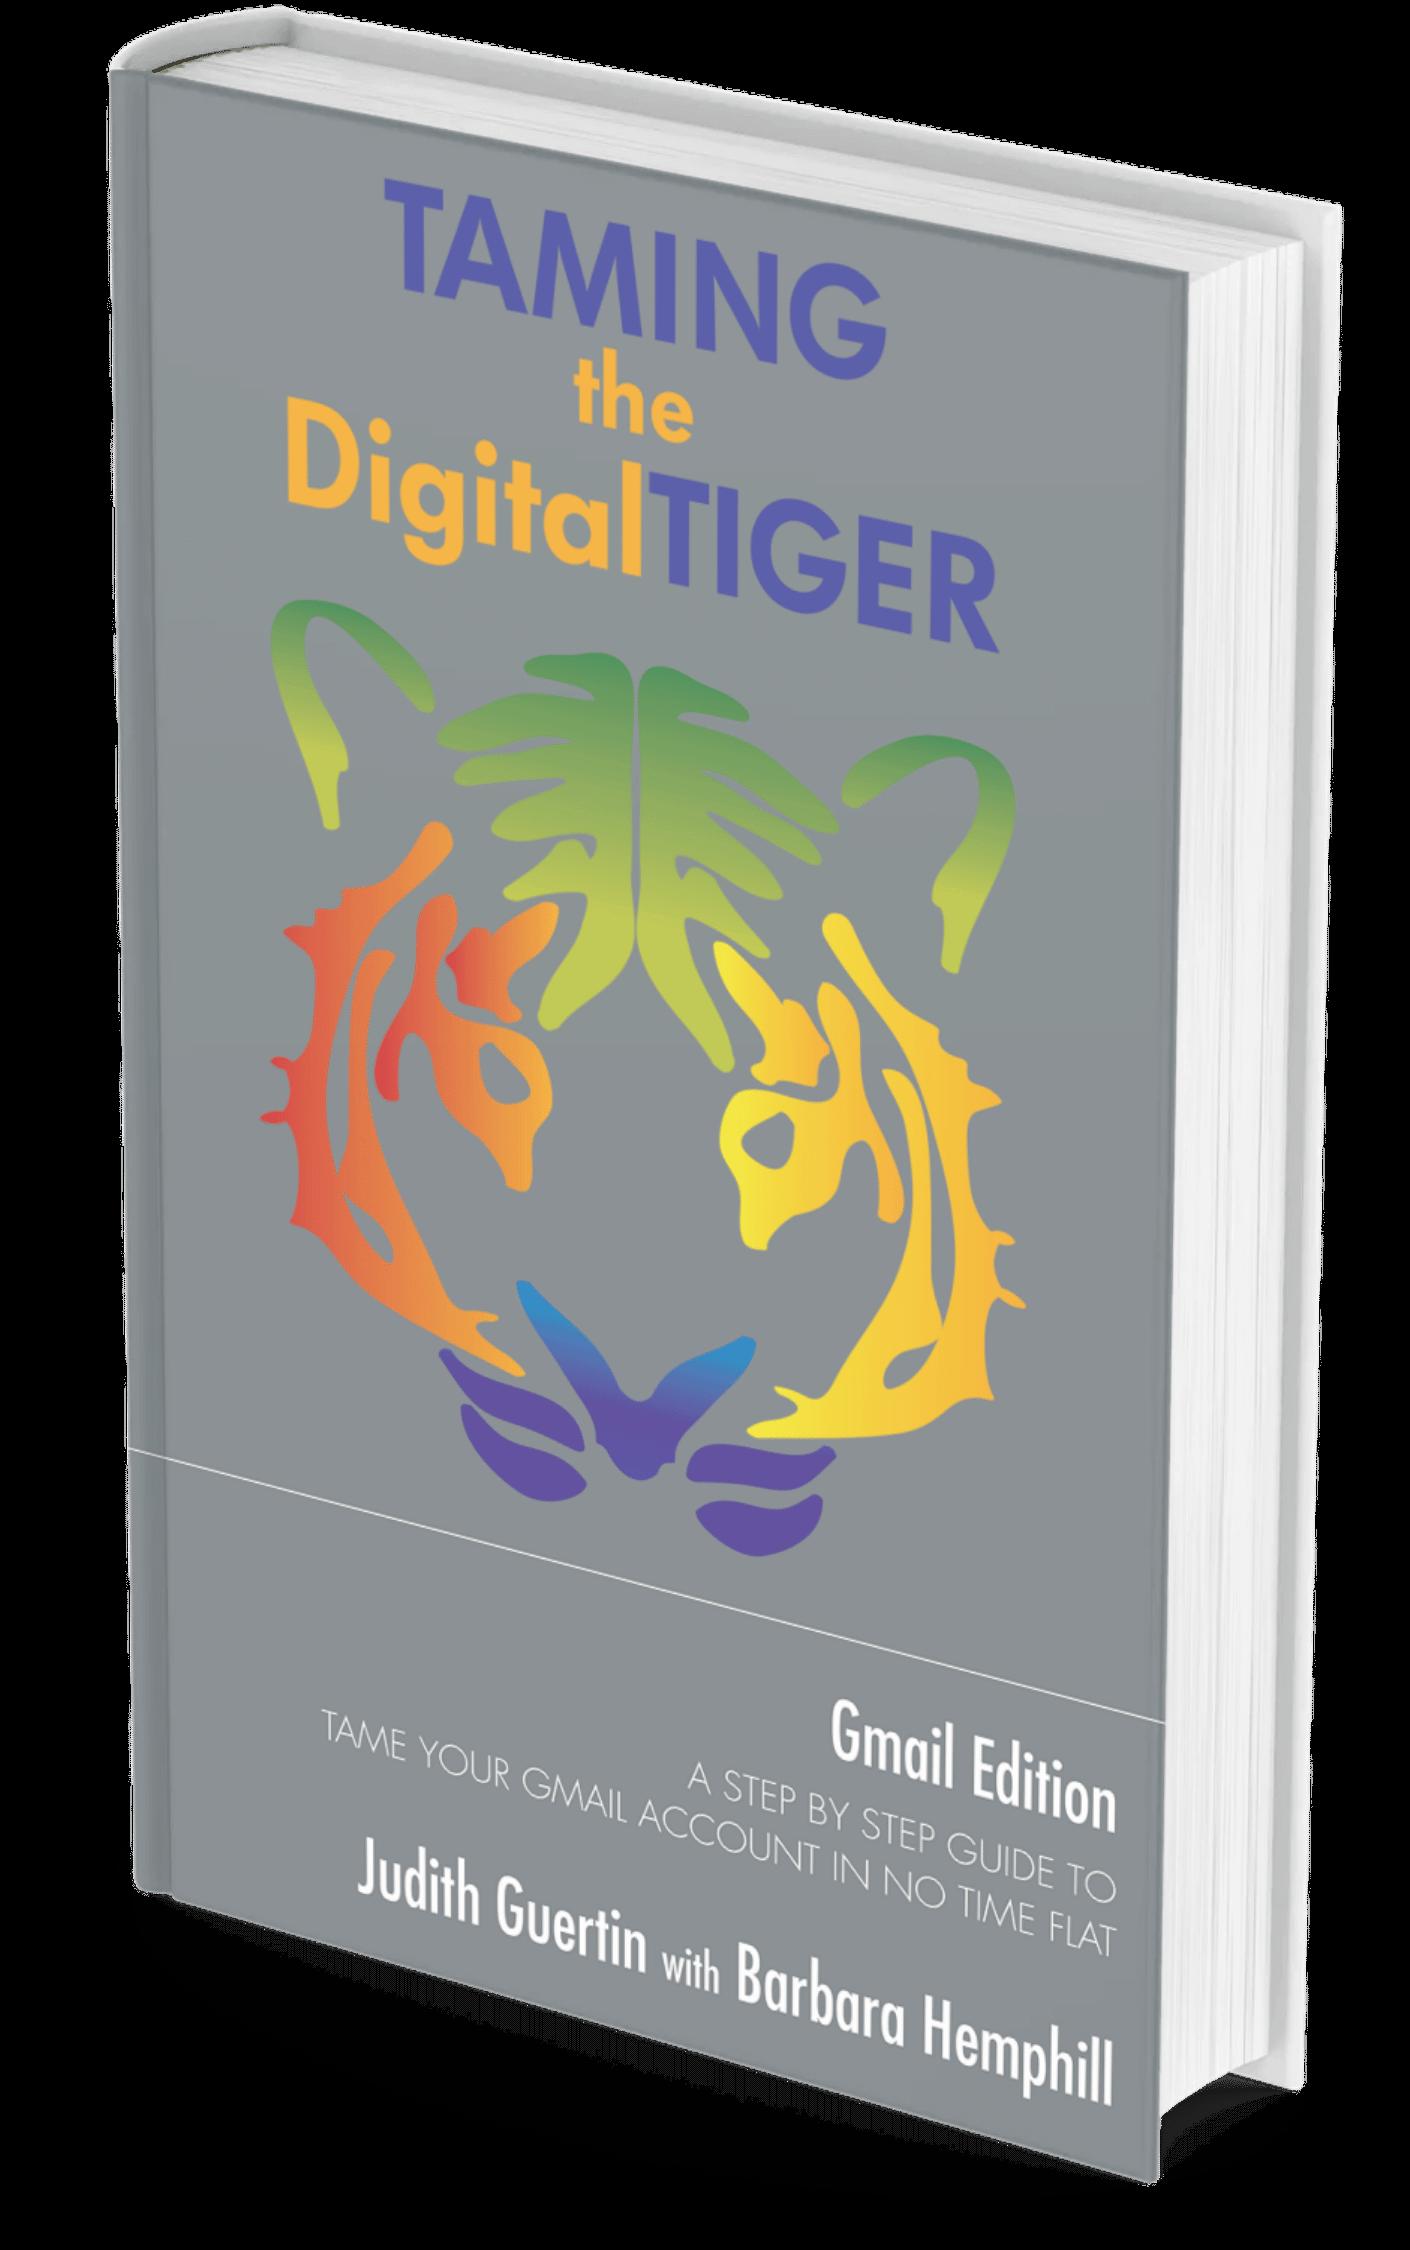 Taming the Digital Tiger